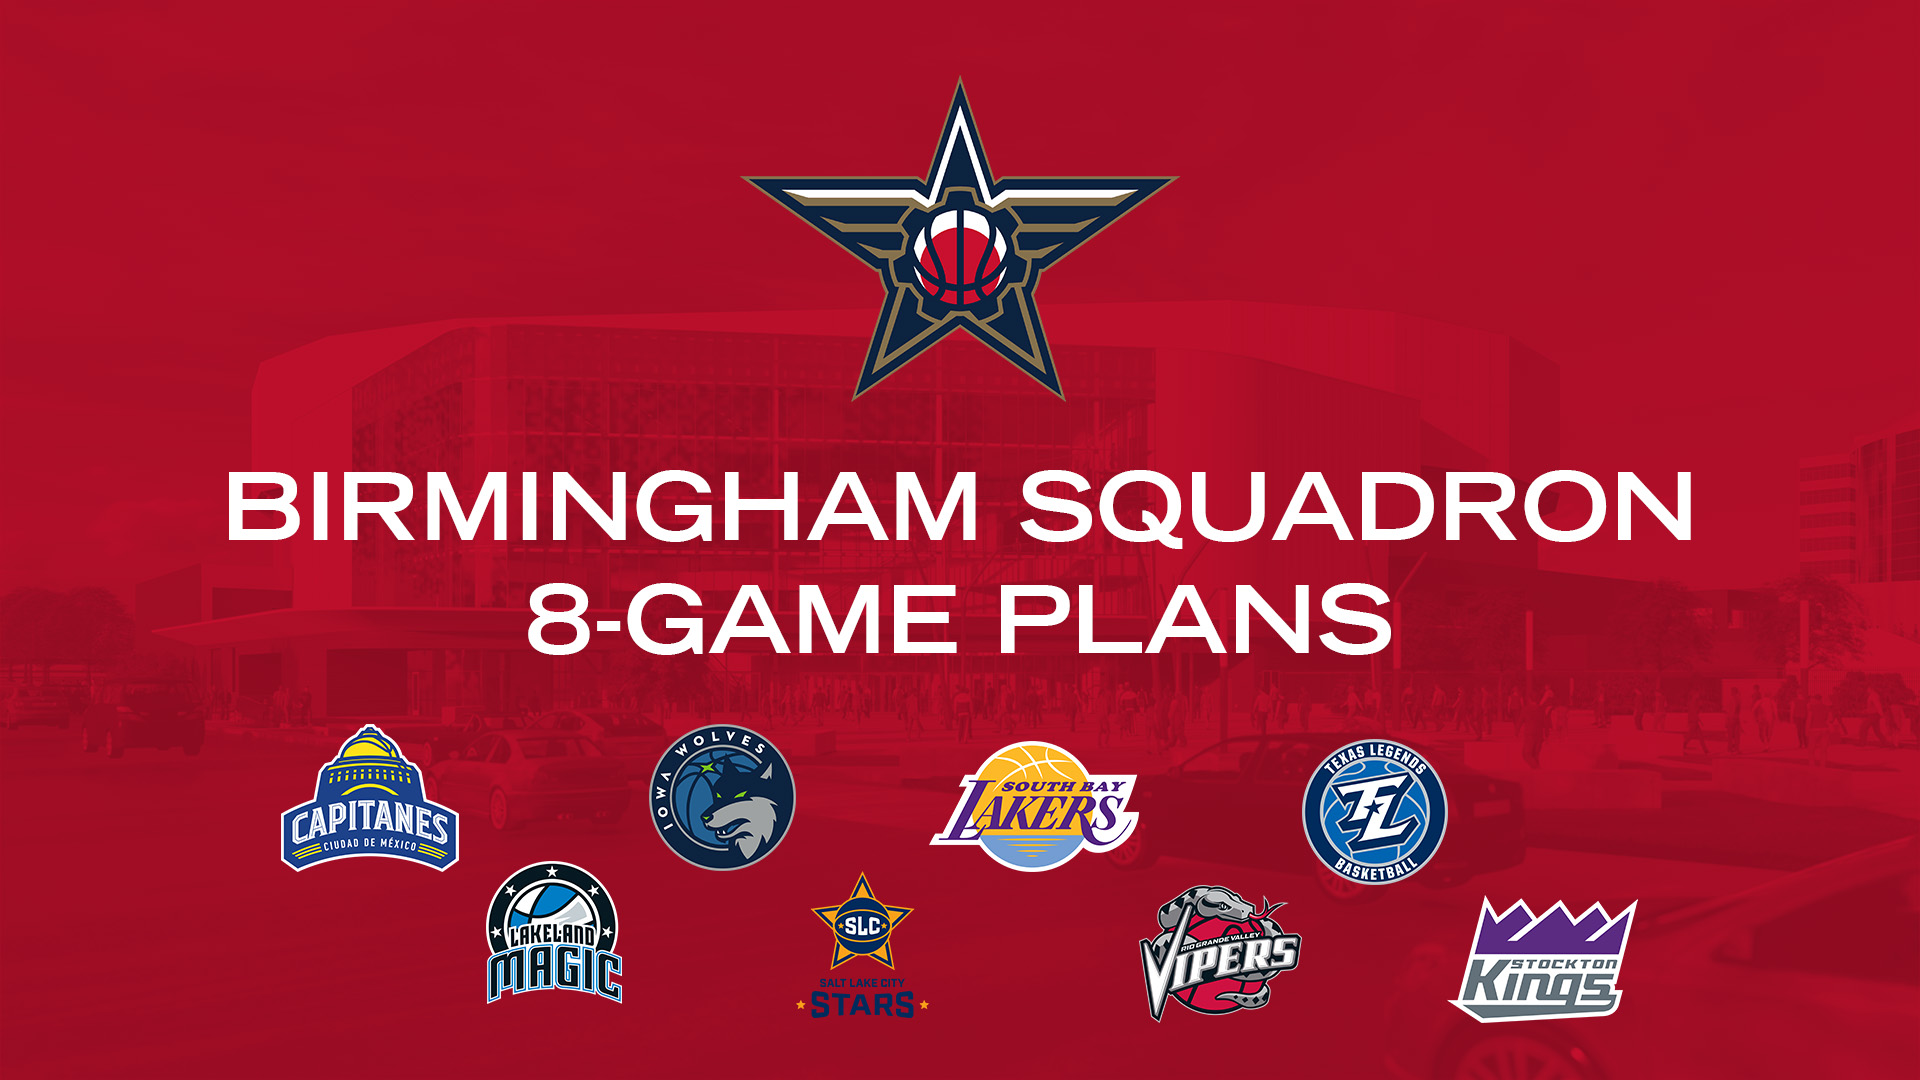 Birmingham Squadron 8-Game Plans